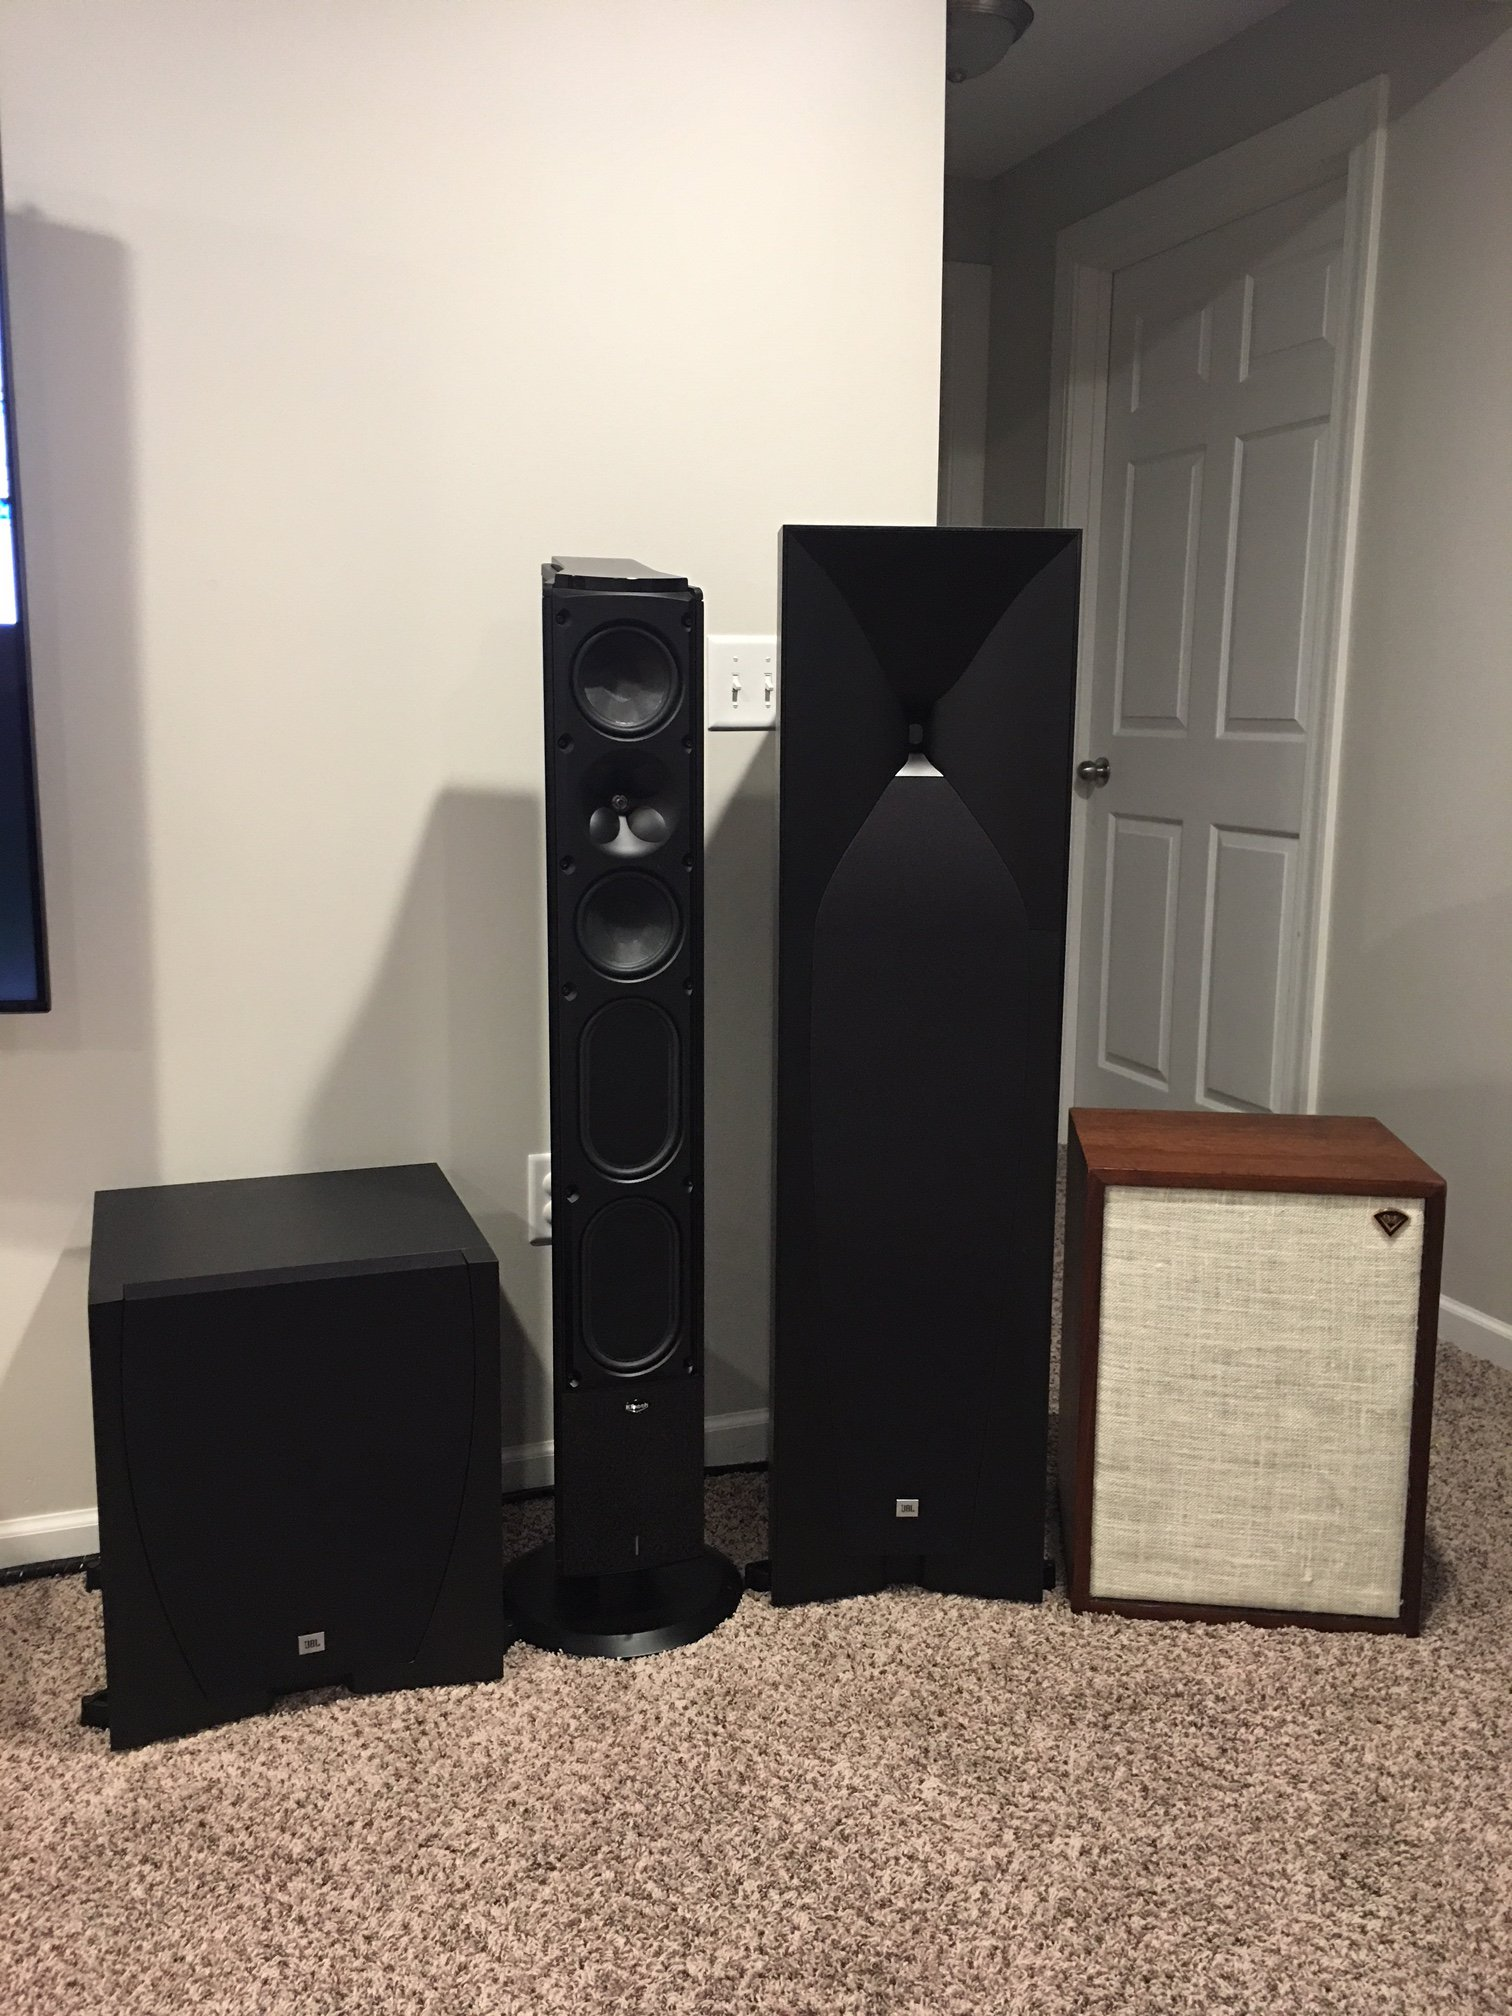 JBL Studio 590s - 2-Channel Home Audio - The Klipsch Audio Community